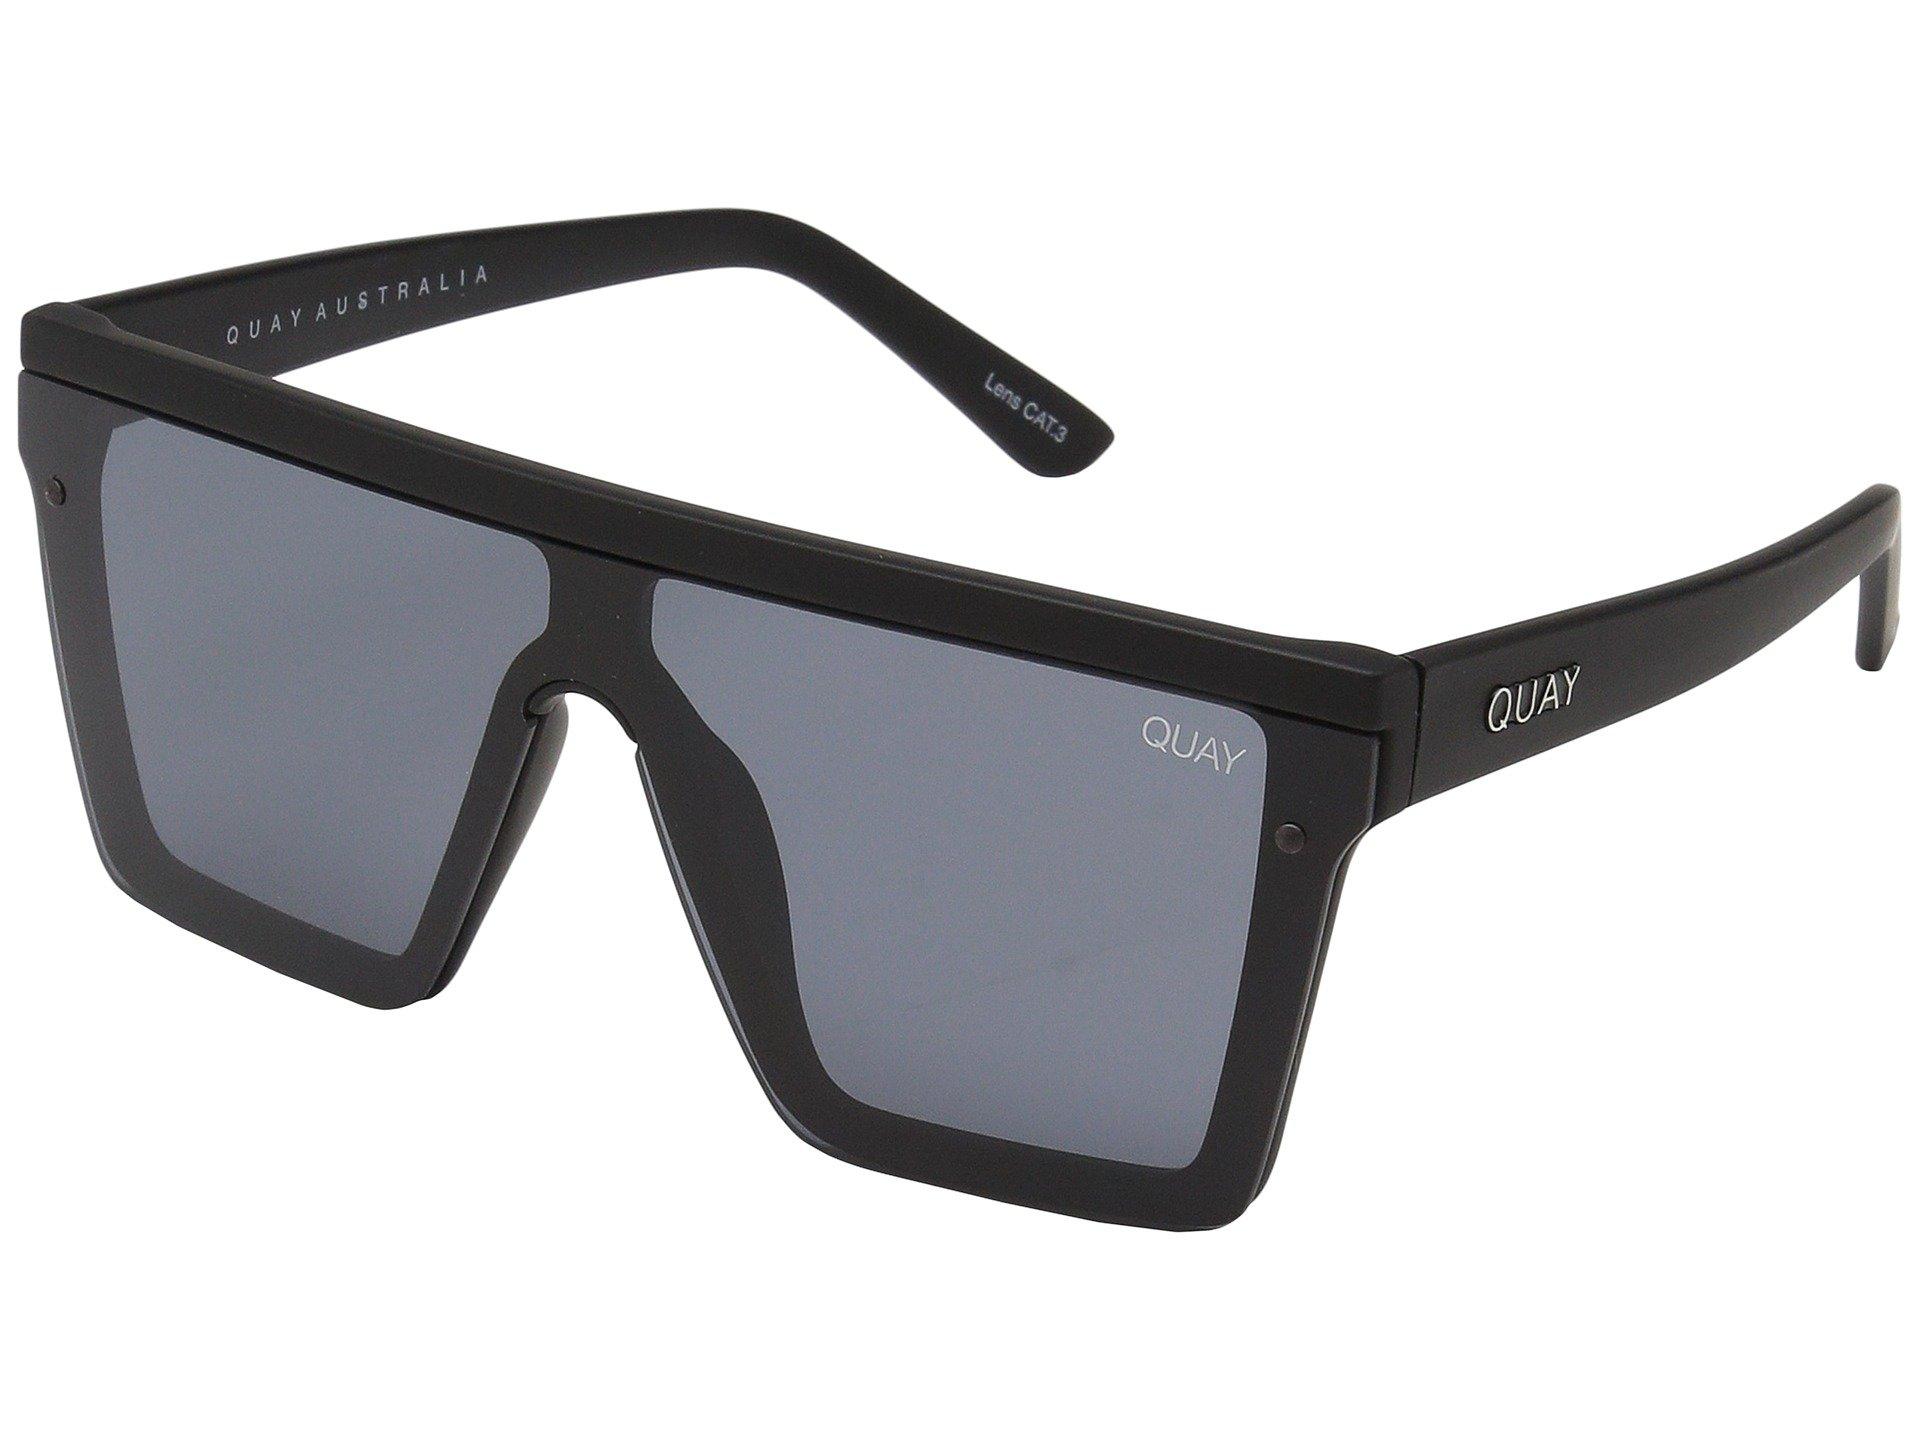 Quay Women's Hindsight Sunglasses, Black/Black, One Size